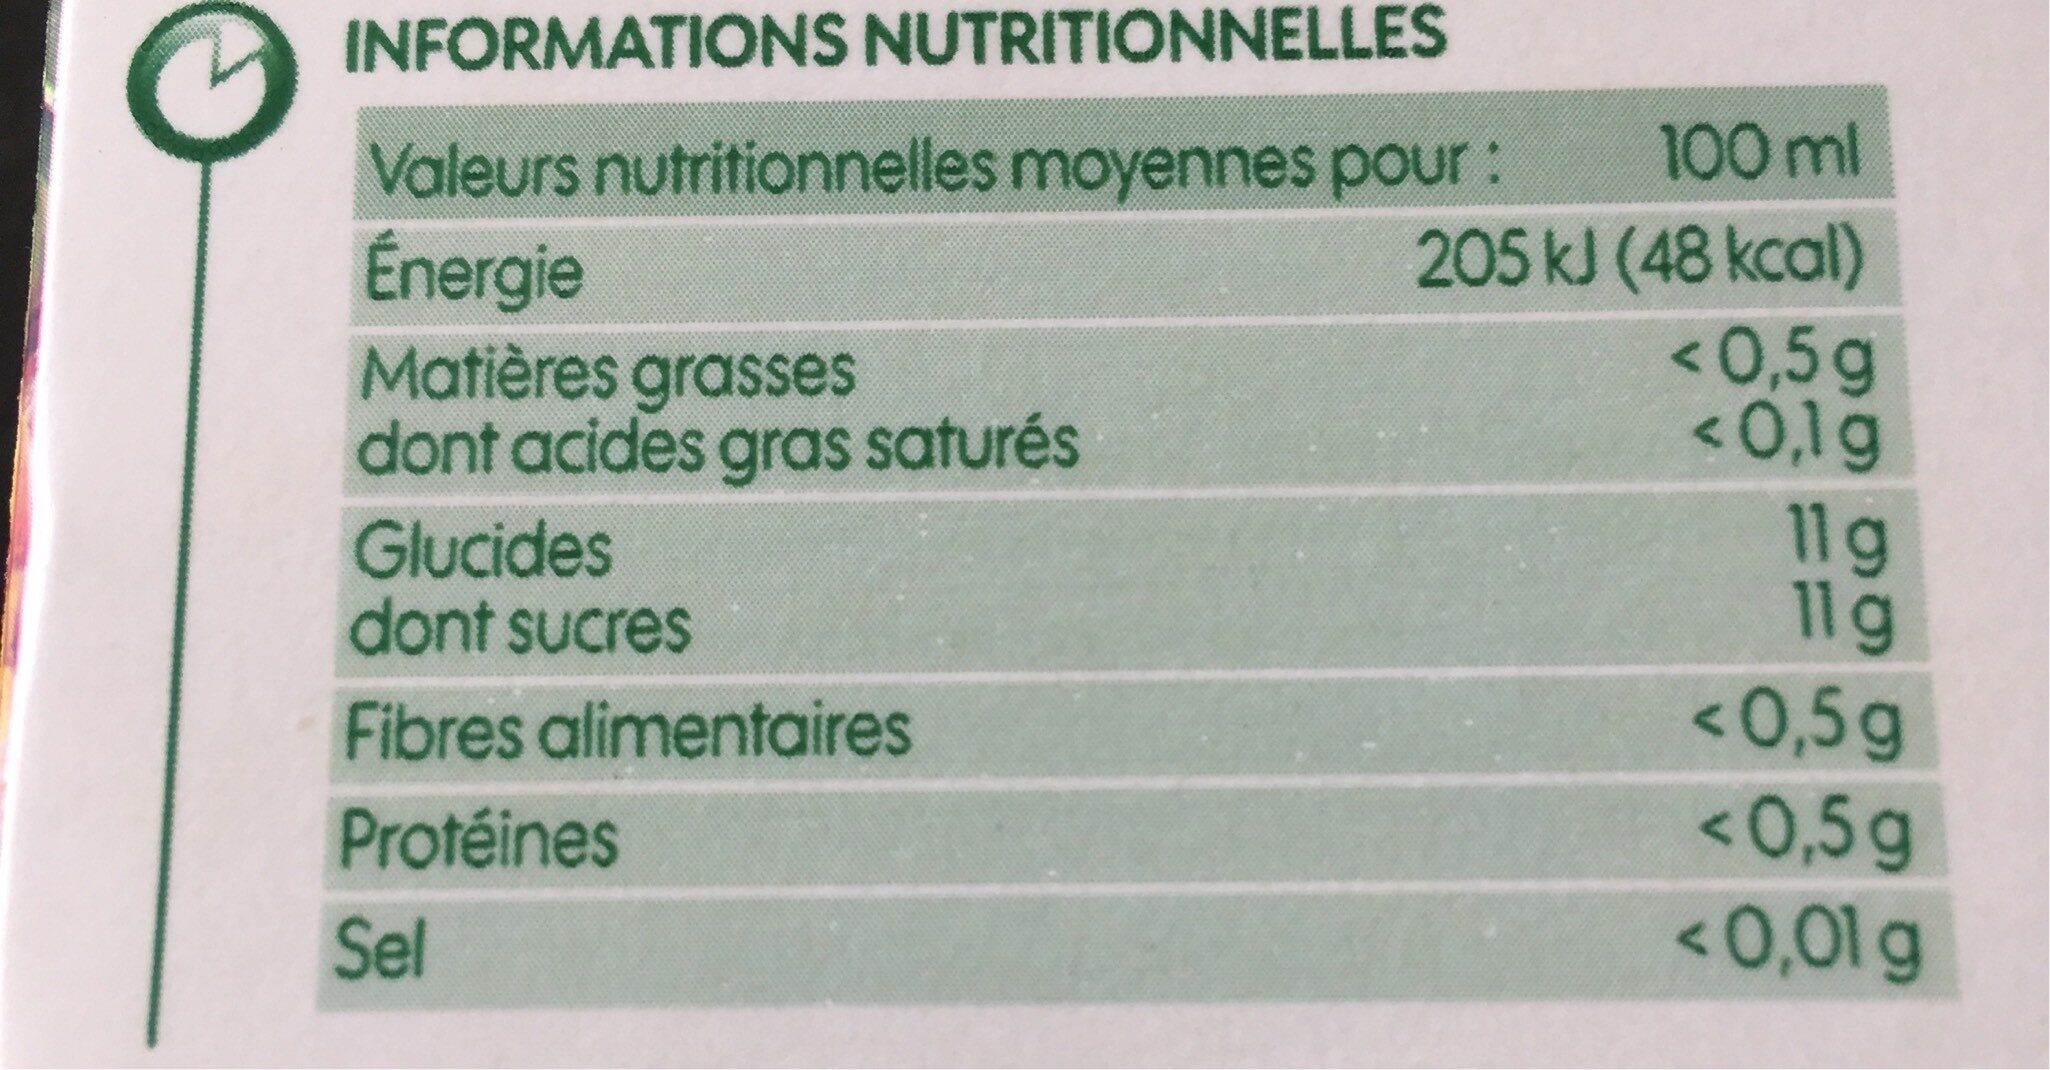 Pur jus fruits exotiques - Informations nutritionnelles